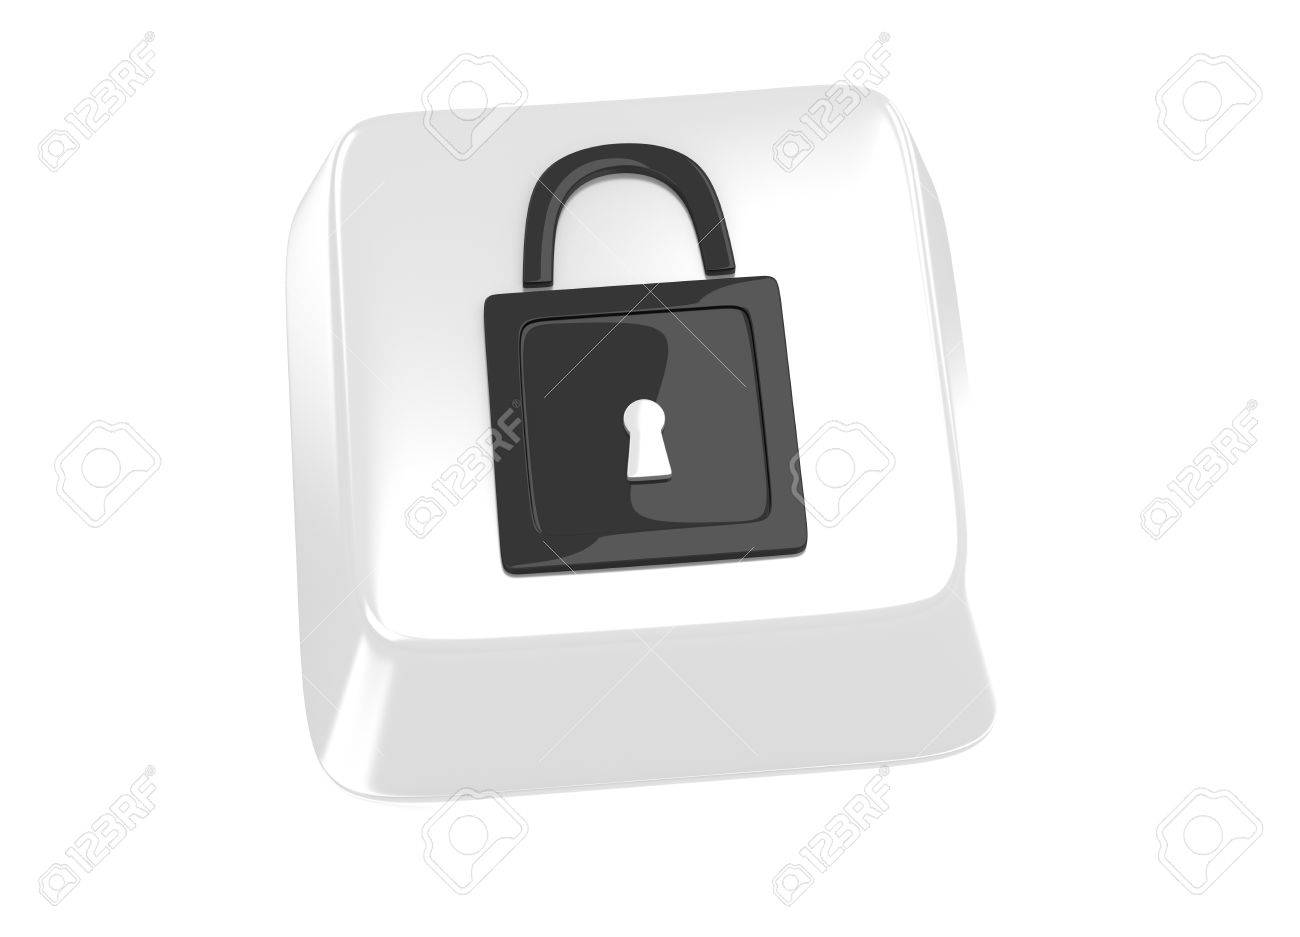 Lock icon in black on white computer key  3d illustration Stock Illustration - 15598377